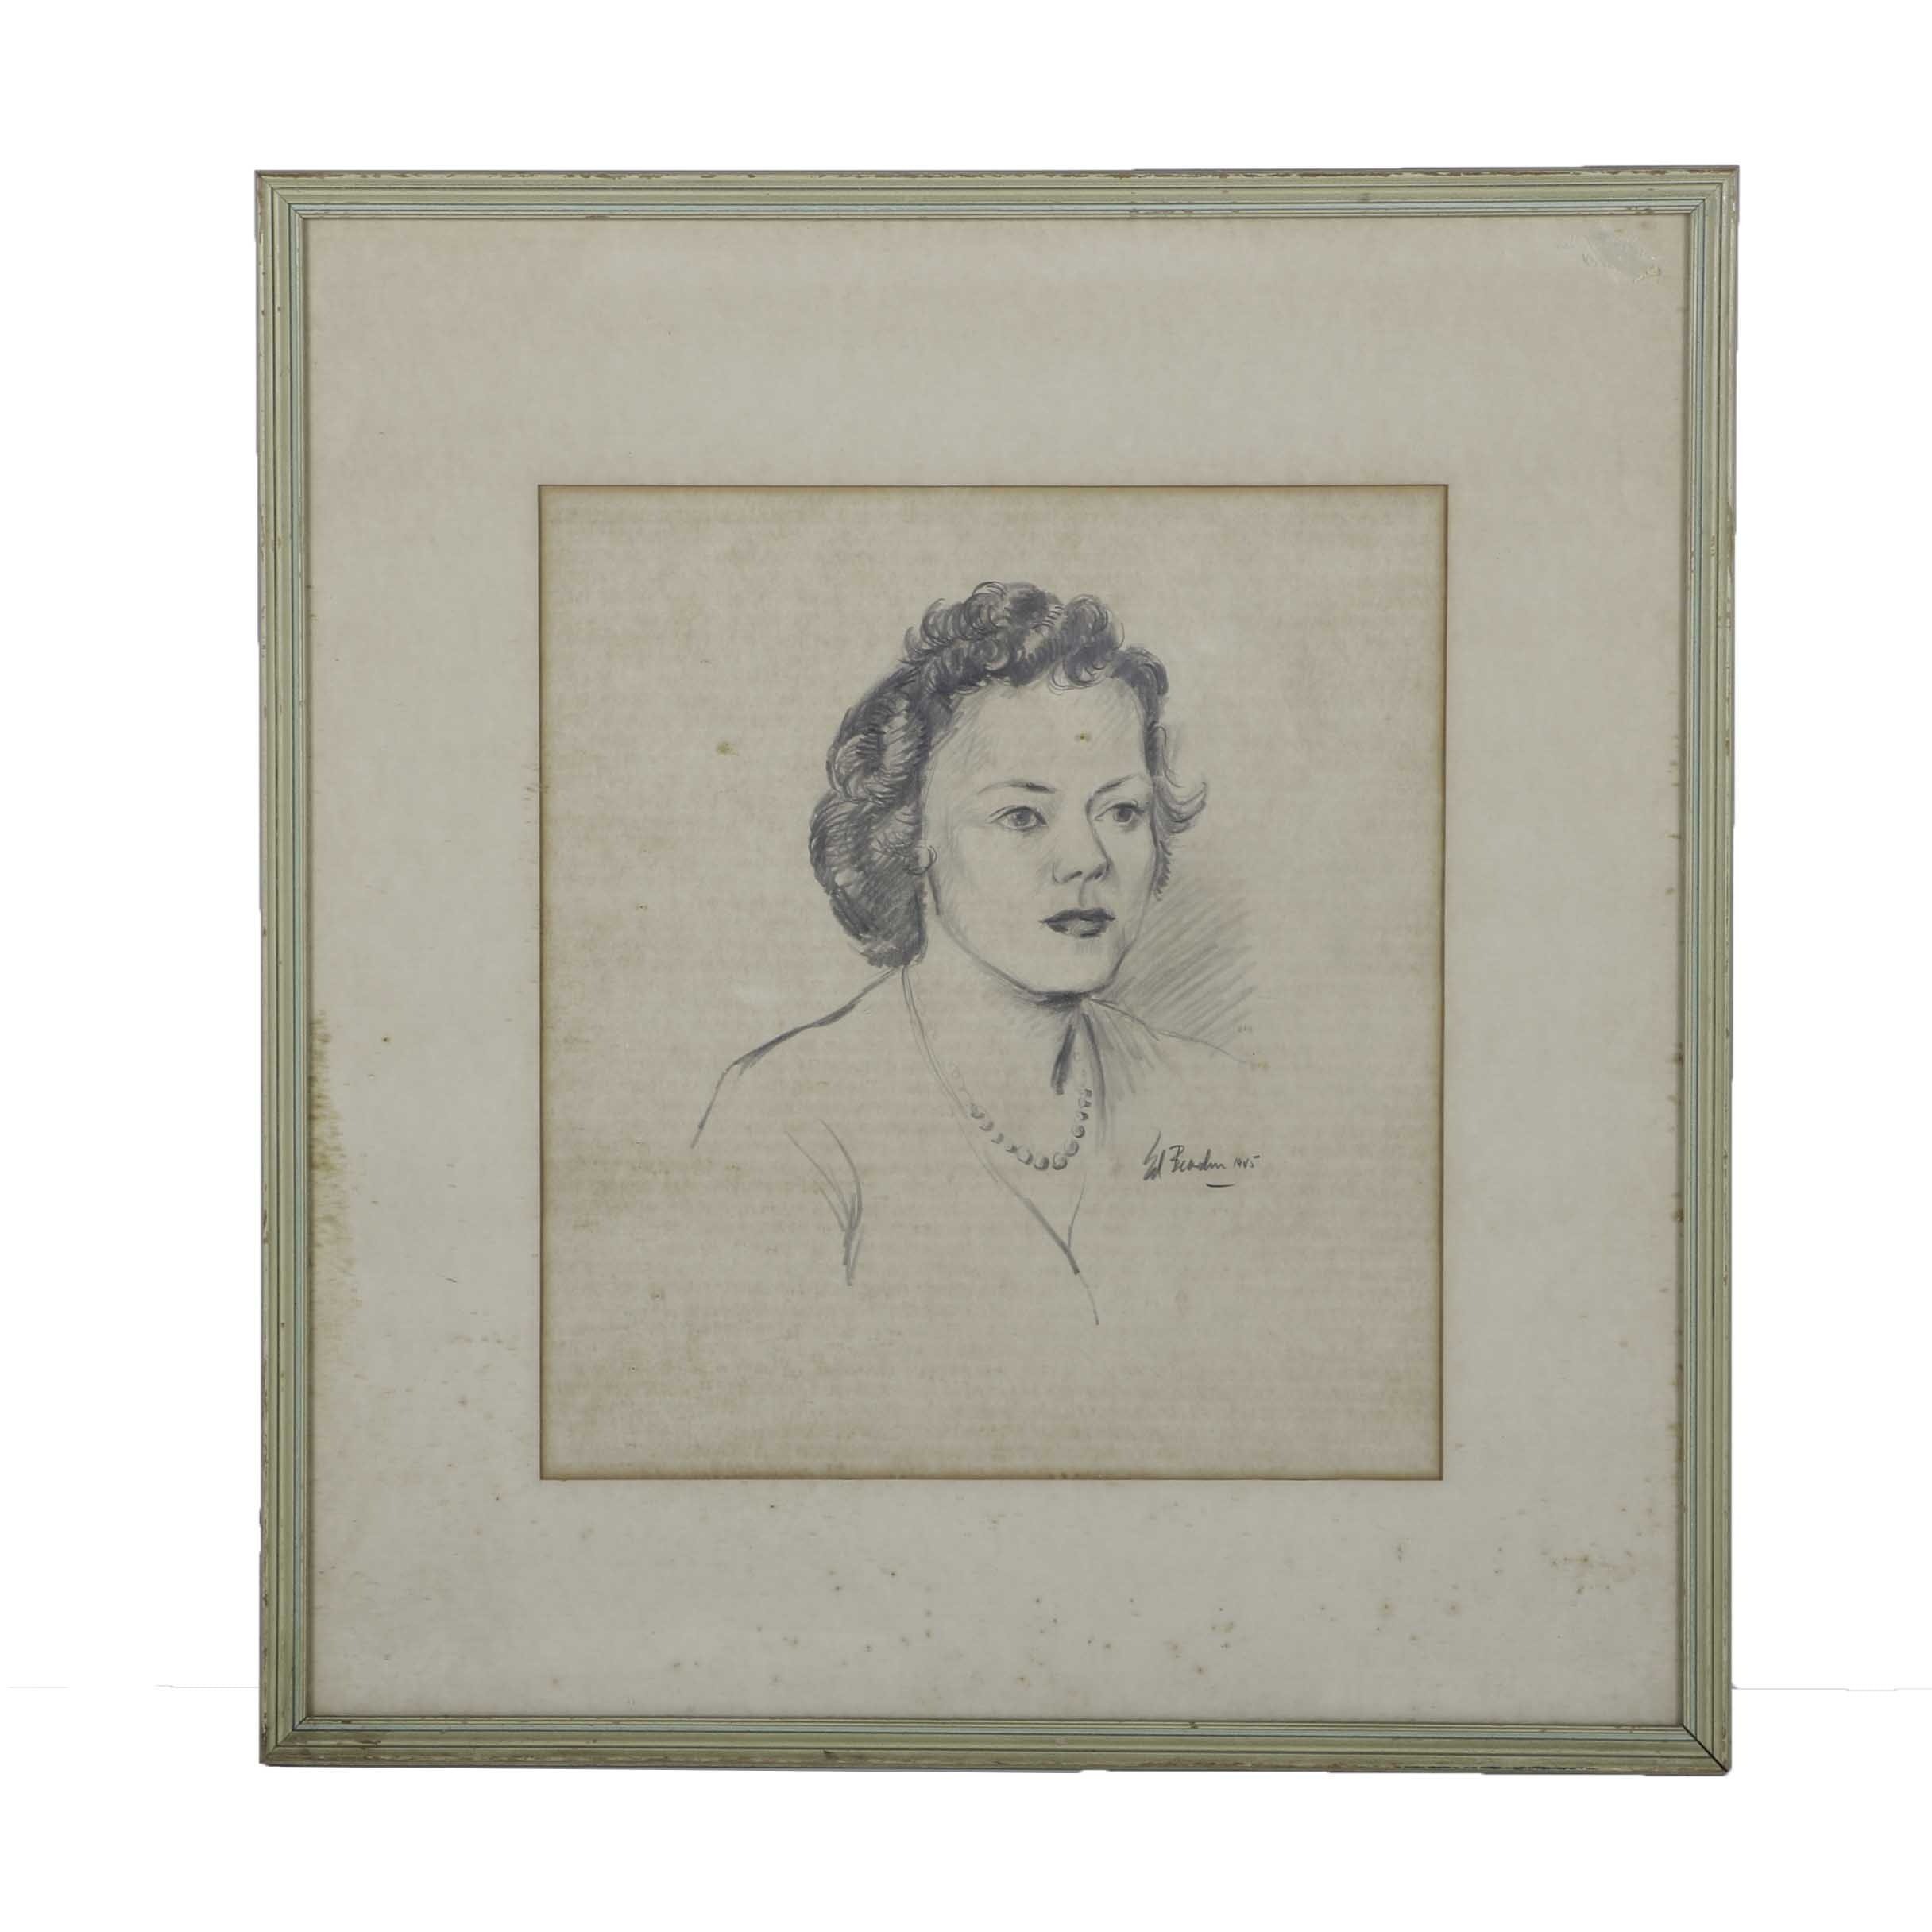 1945 Edward Bearden Graphite on Paper Portrait